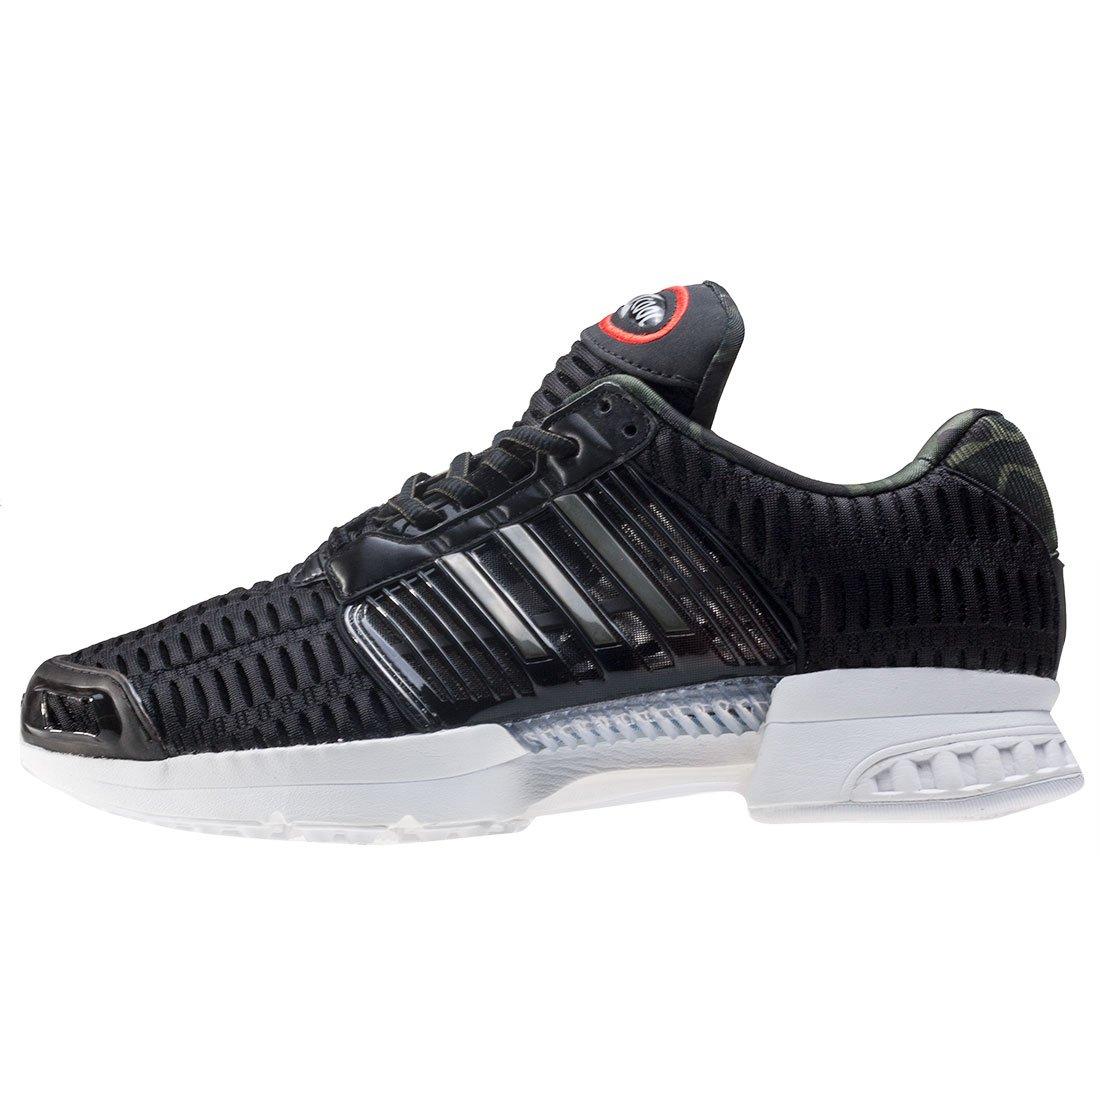 Adidas Herren Cool Clima Cool Herren 1 927 Turnschuhe 2ca497